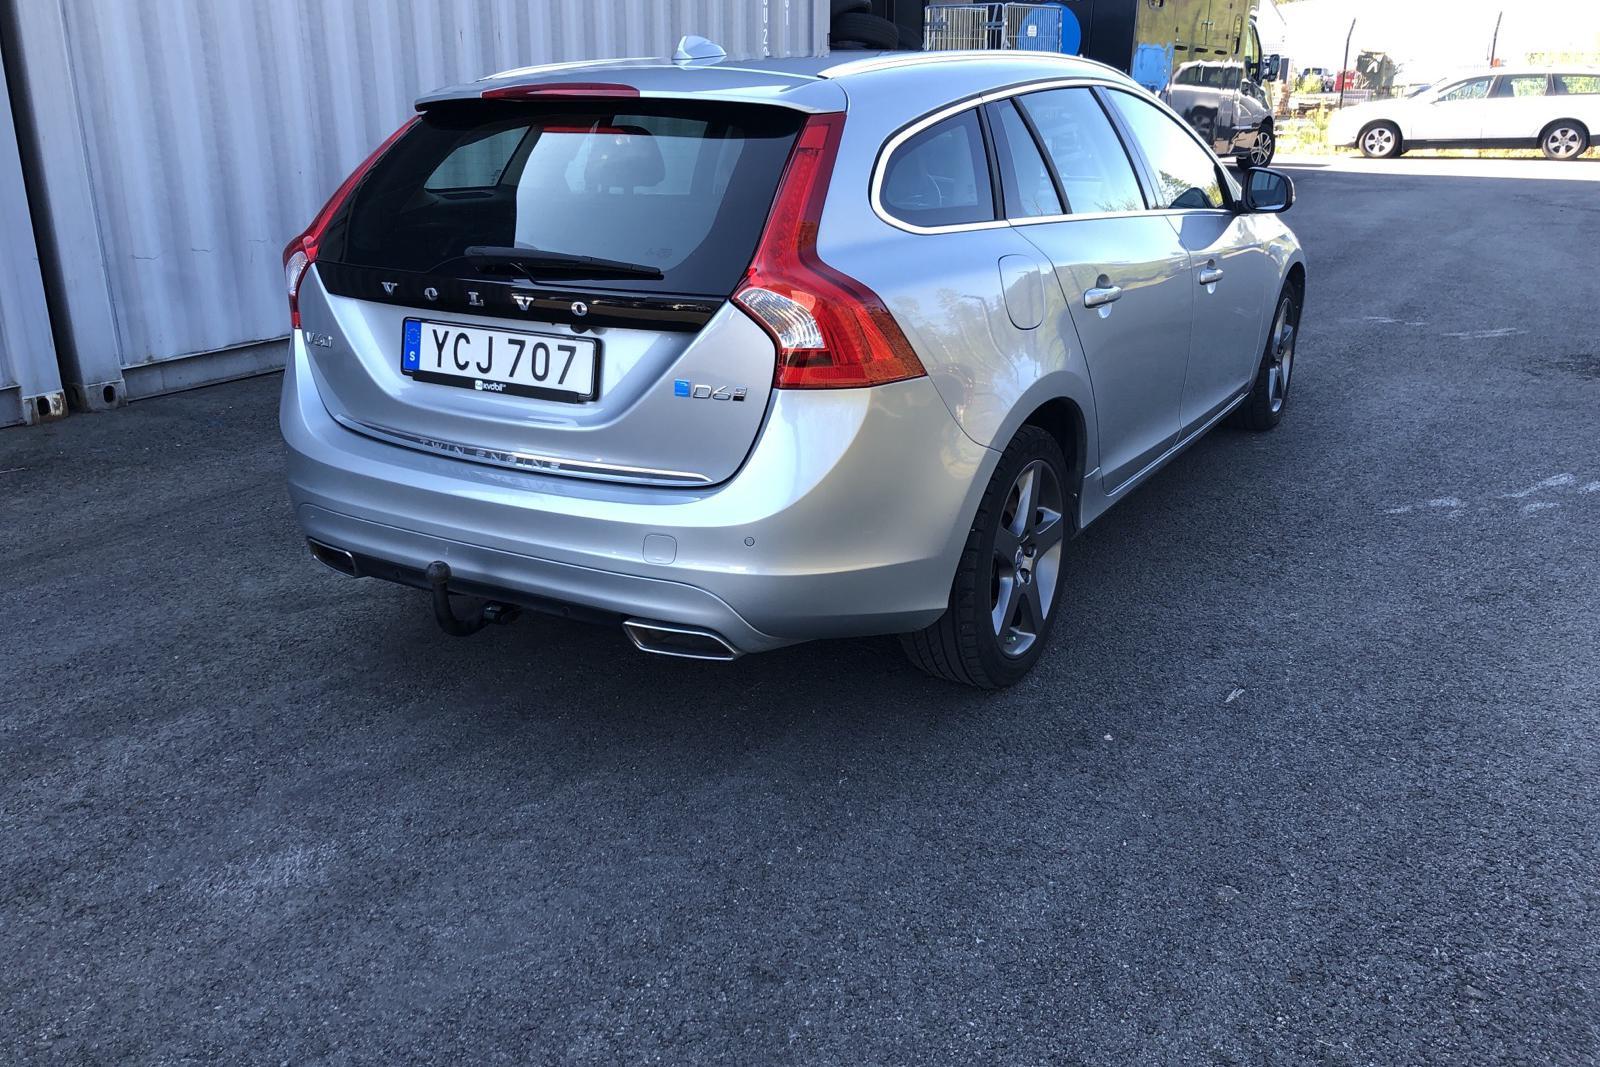 Volvo V60 D6 AWD Twin Engine (220hk)V60 D6 AWD Twin Engine (220hk) - 73 610 km - Automatic - silver - 2016